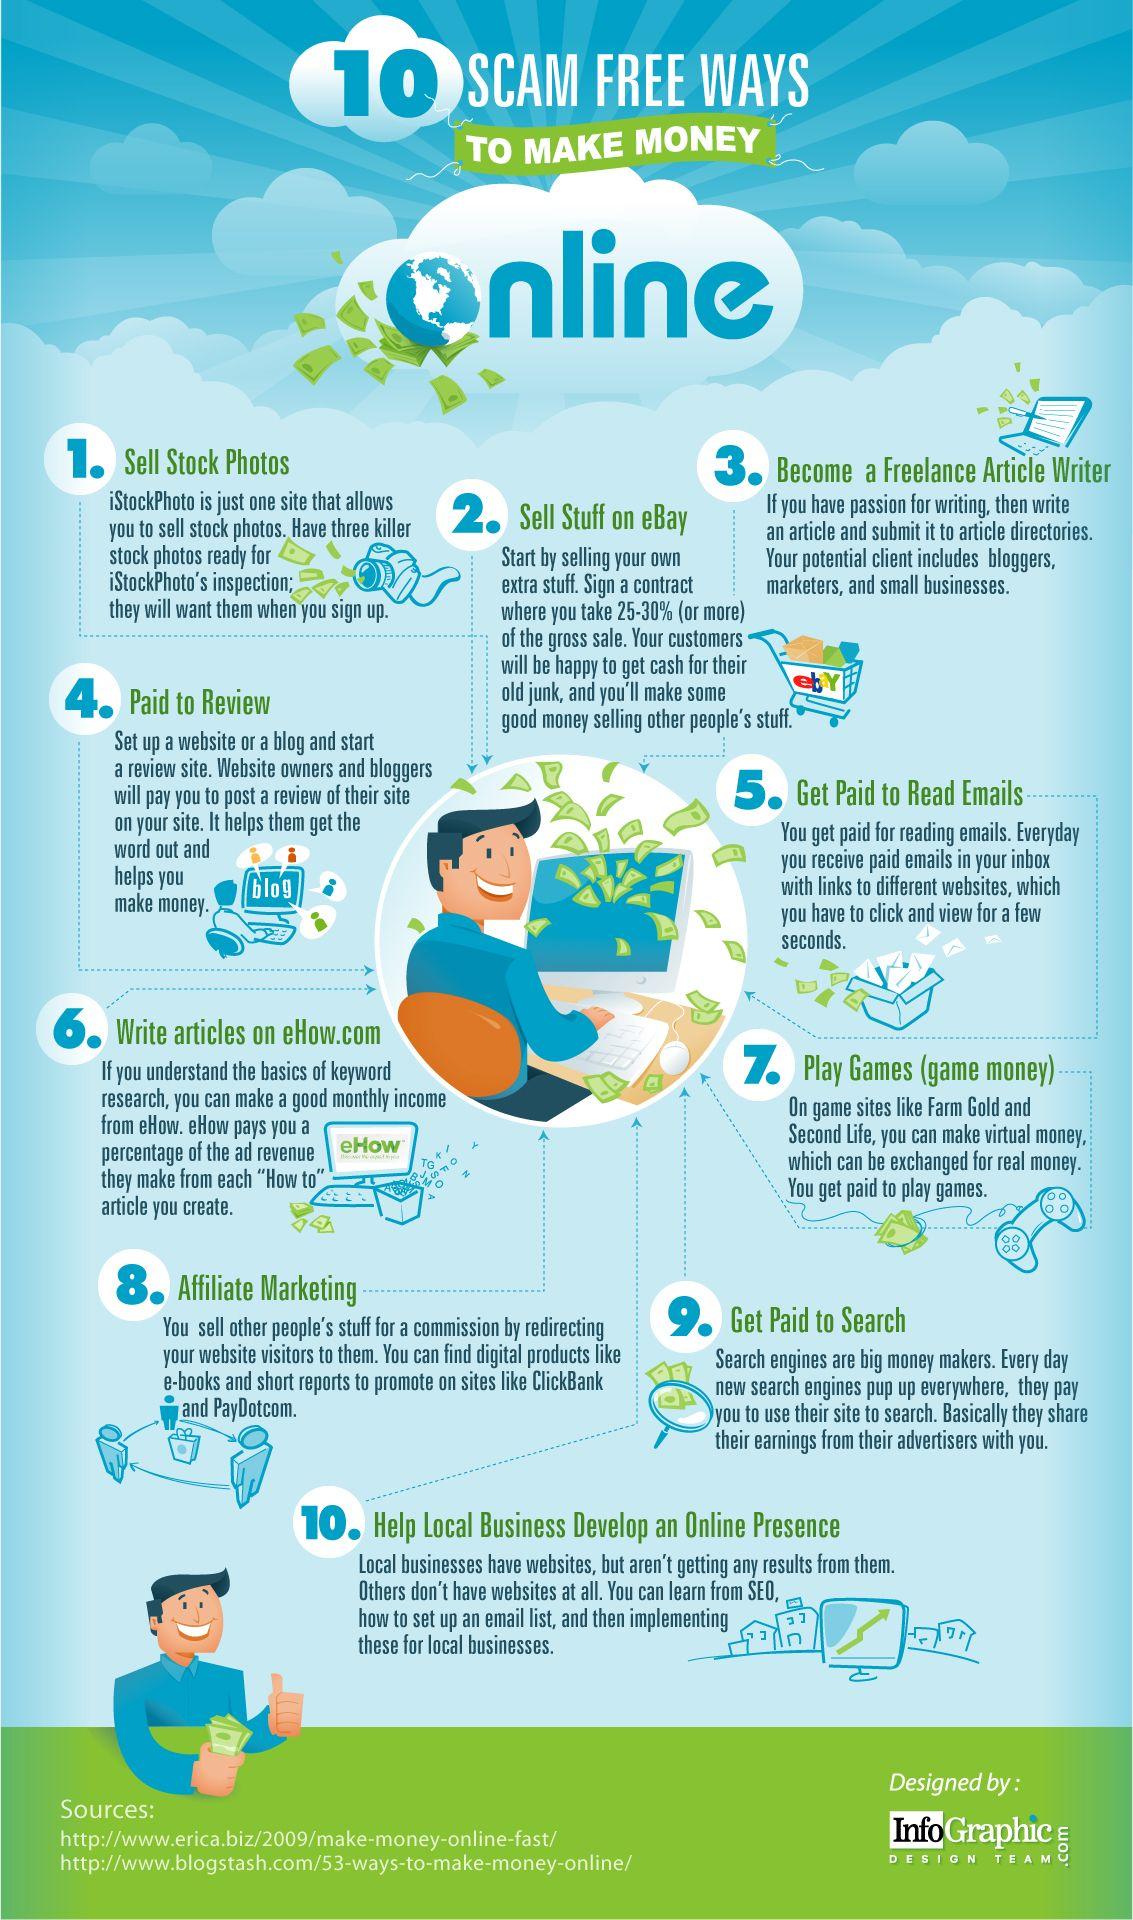 10 Scam Free Ways To Make Money Online [infographic]